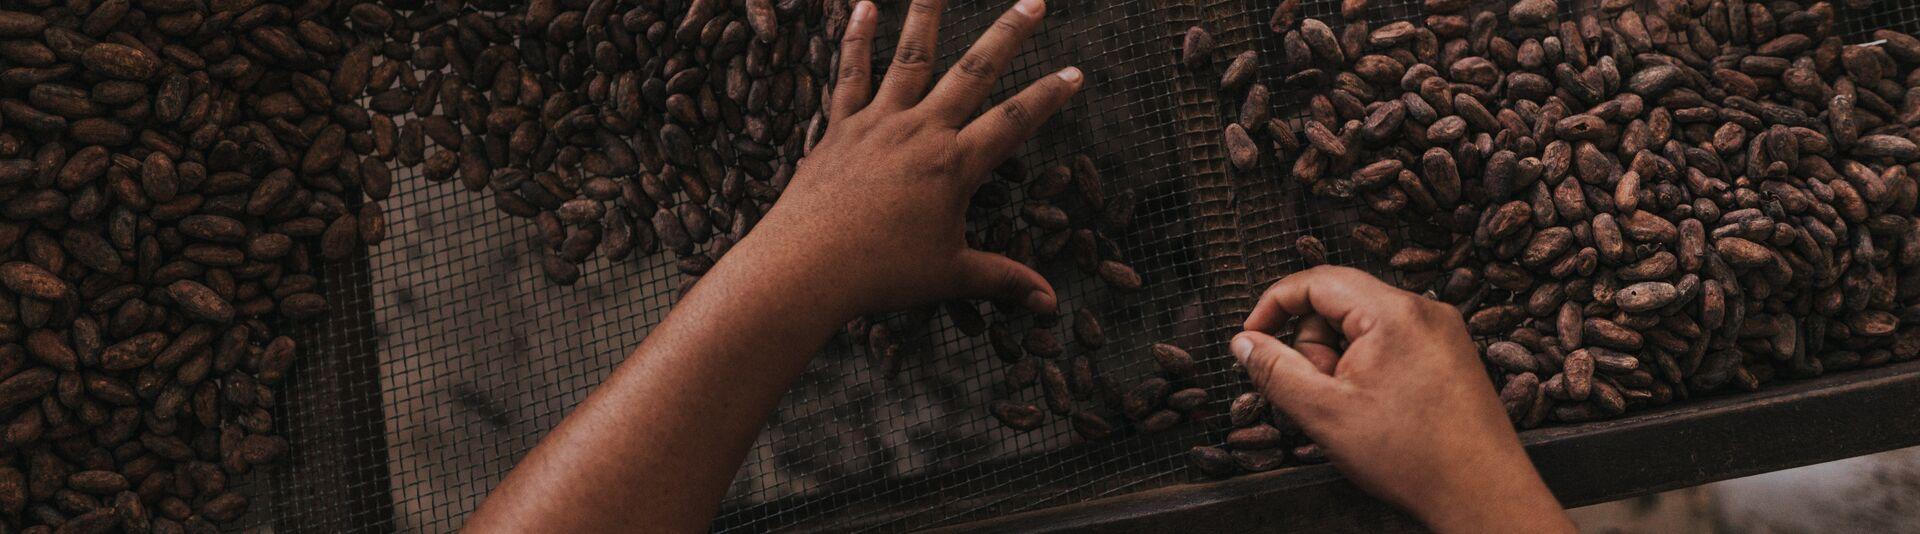 valrhona.us-live-long-cocoa-banner